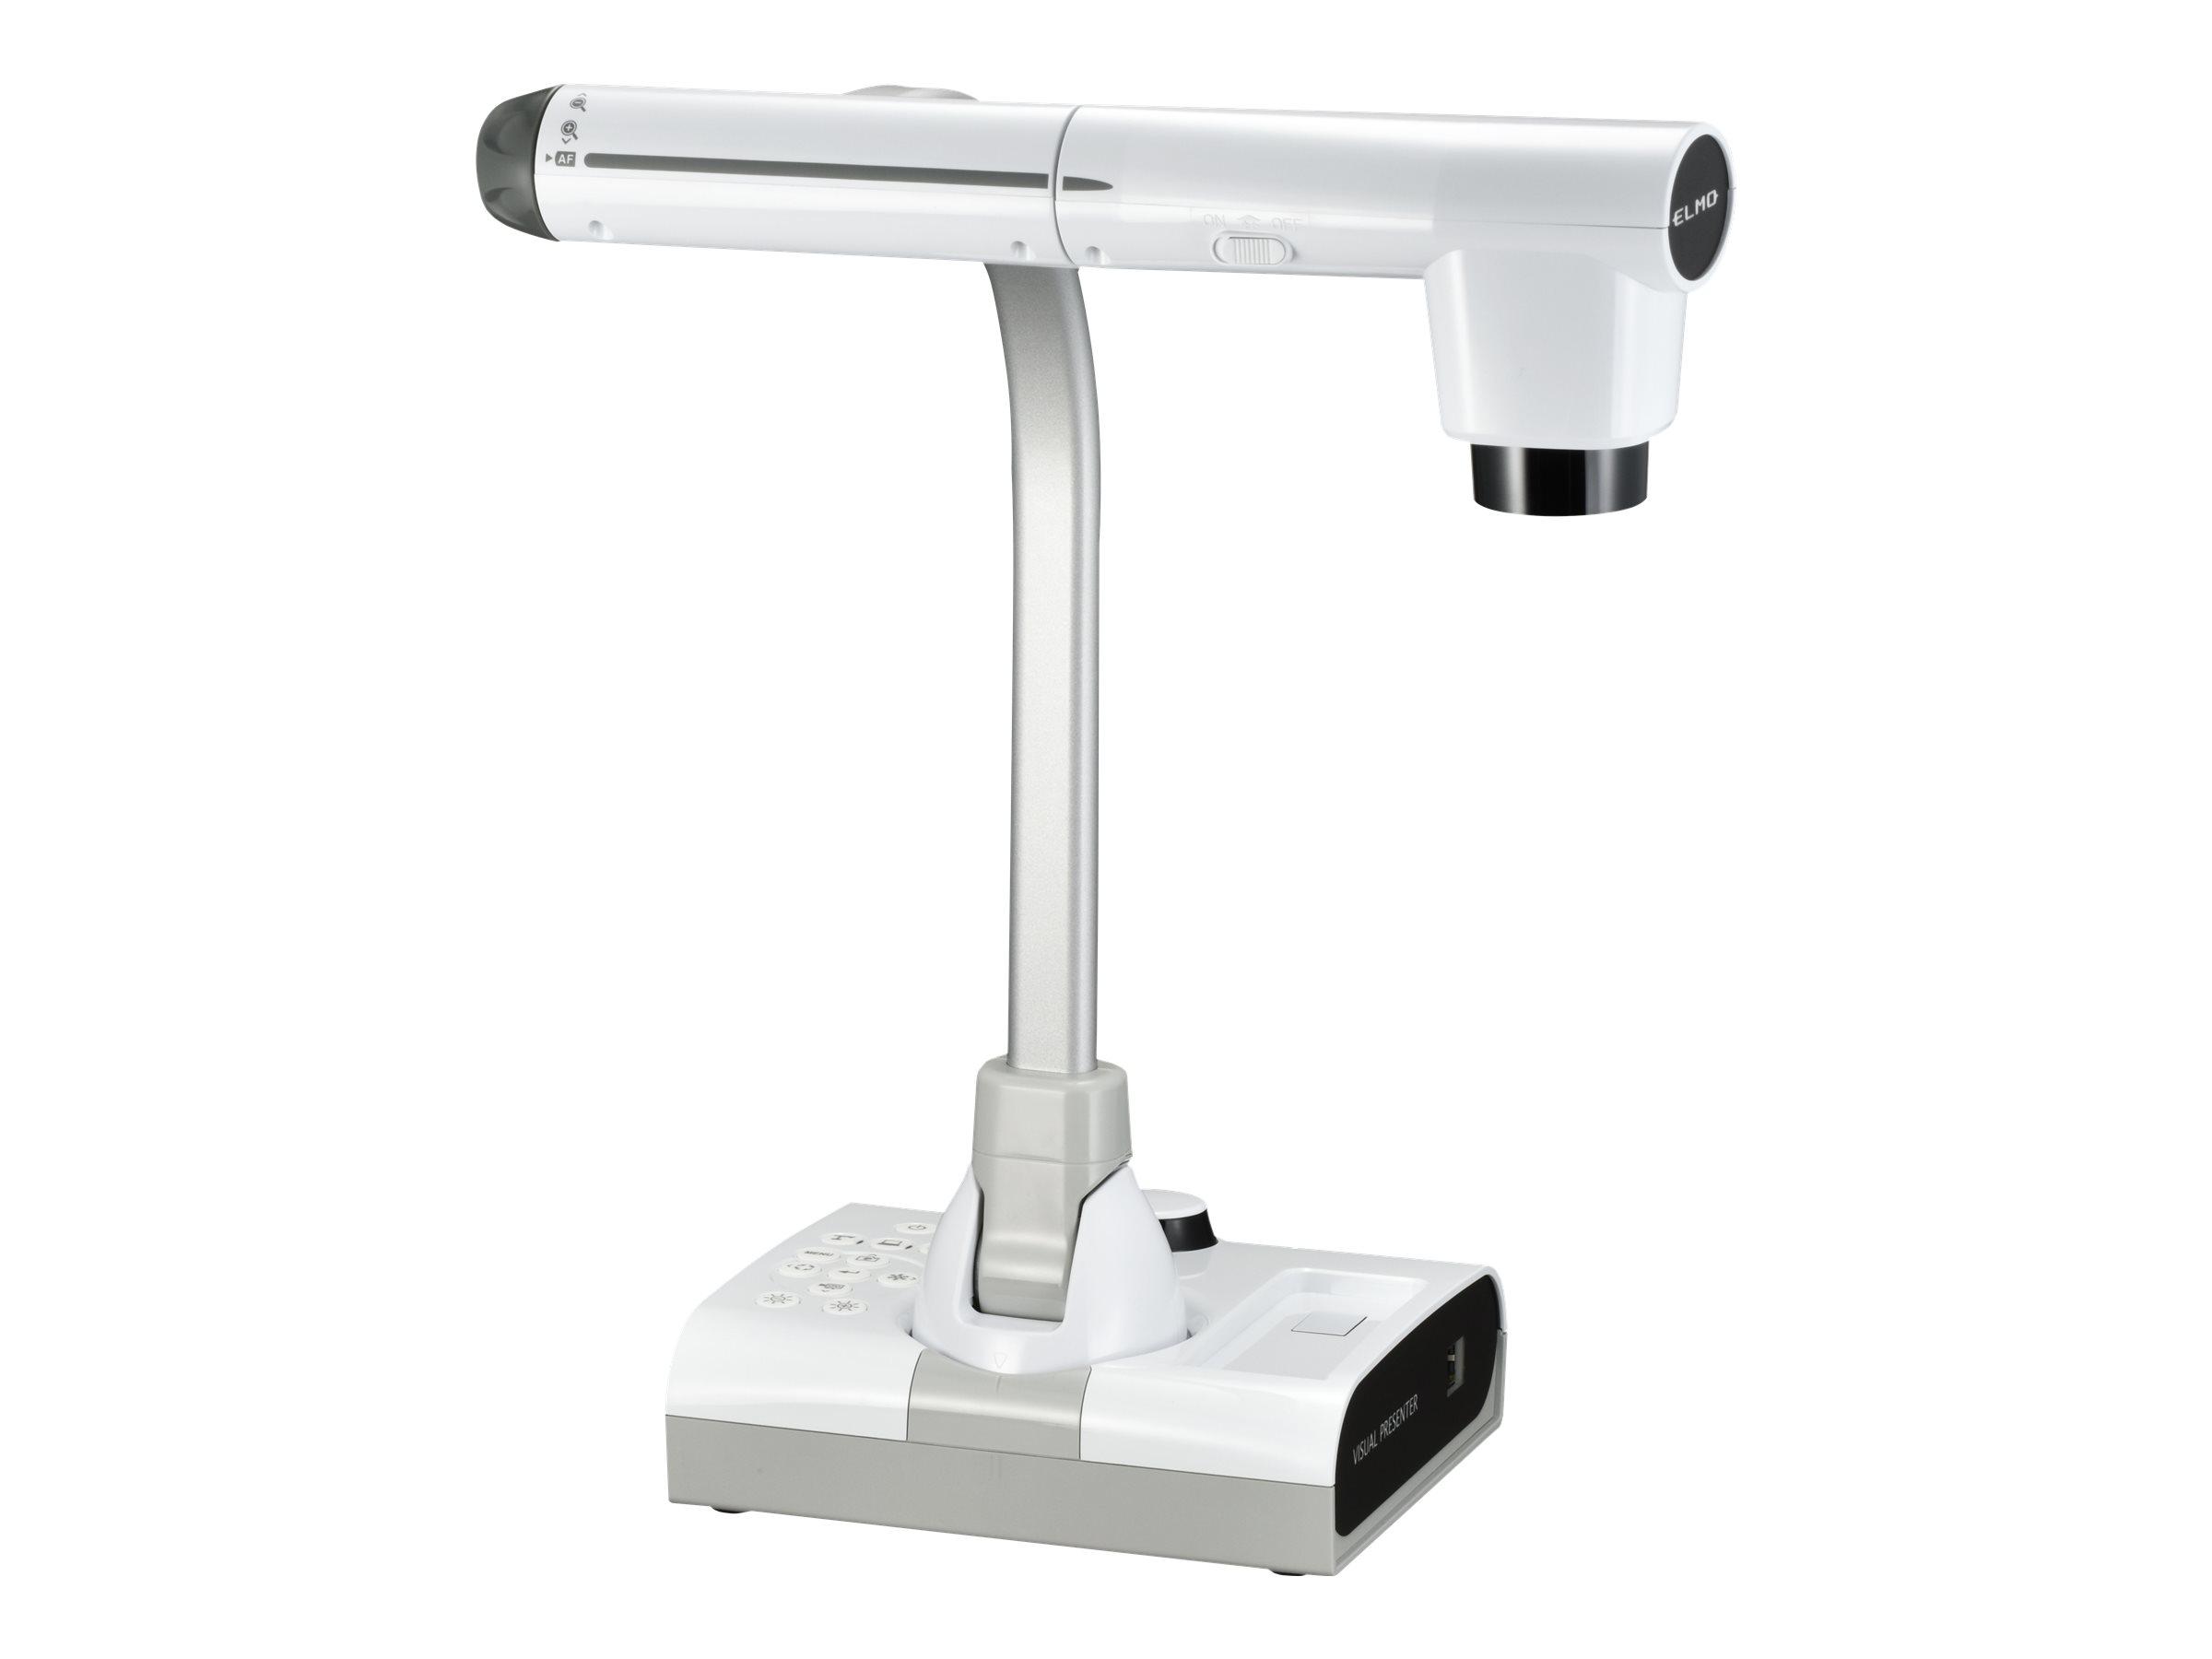 Elmo TT-12W STEM-CAM - Digitale Dokumentenkamera - Farbe - 3,4 MP - 1920 x 1080 - 720p, 1080p